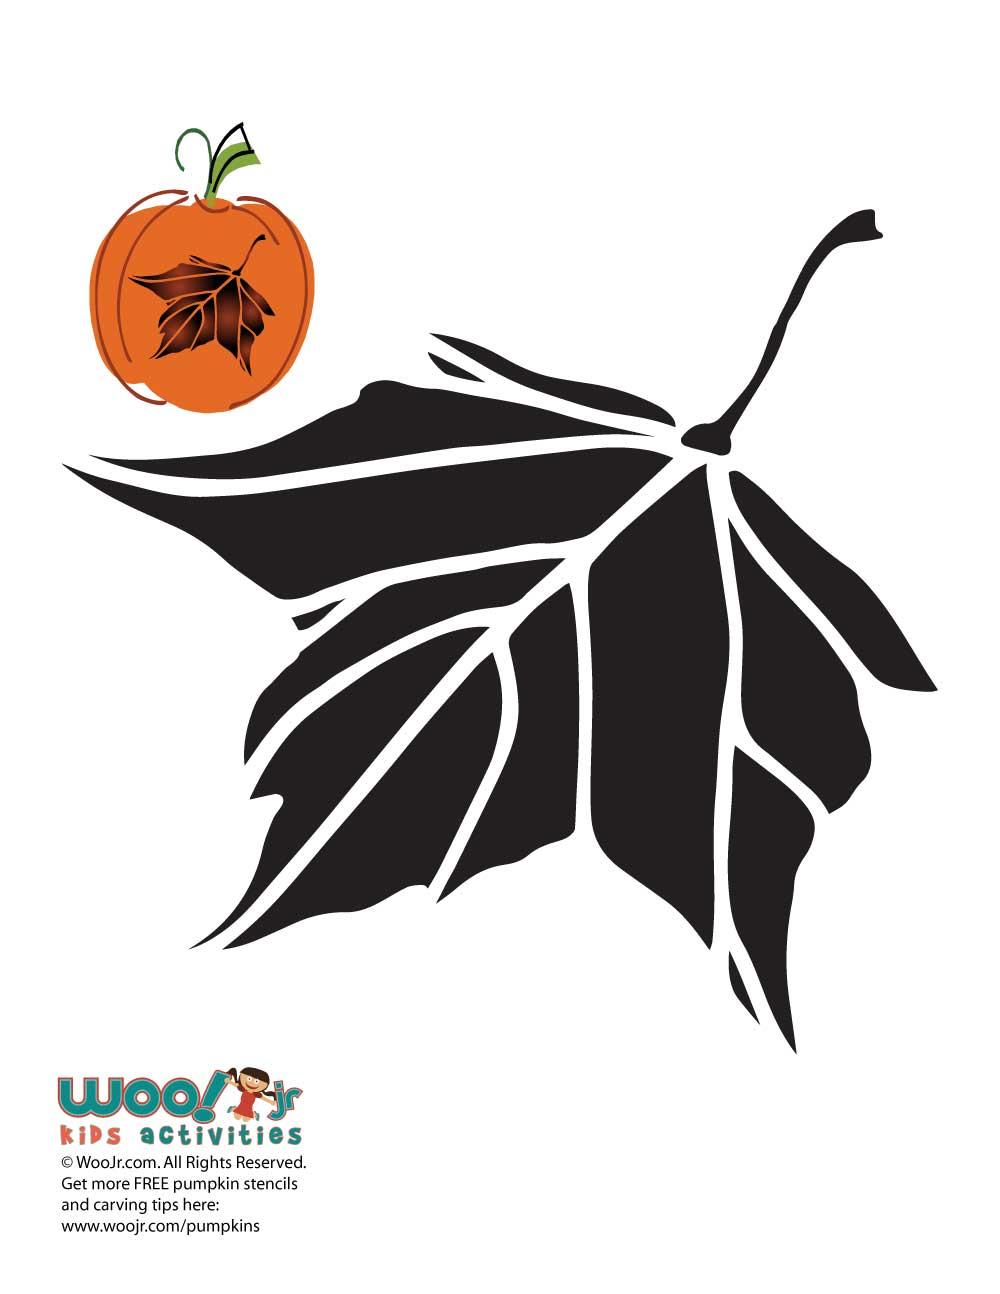 Maple leaf pumpkin carving pattern woo jr kids activities for Fall pumpkin stencils